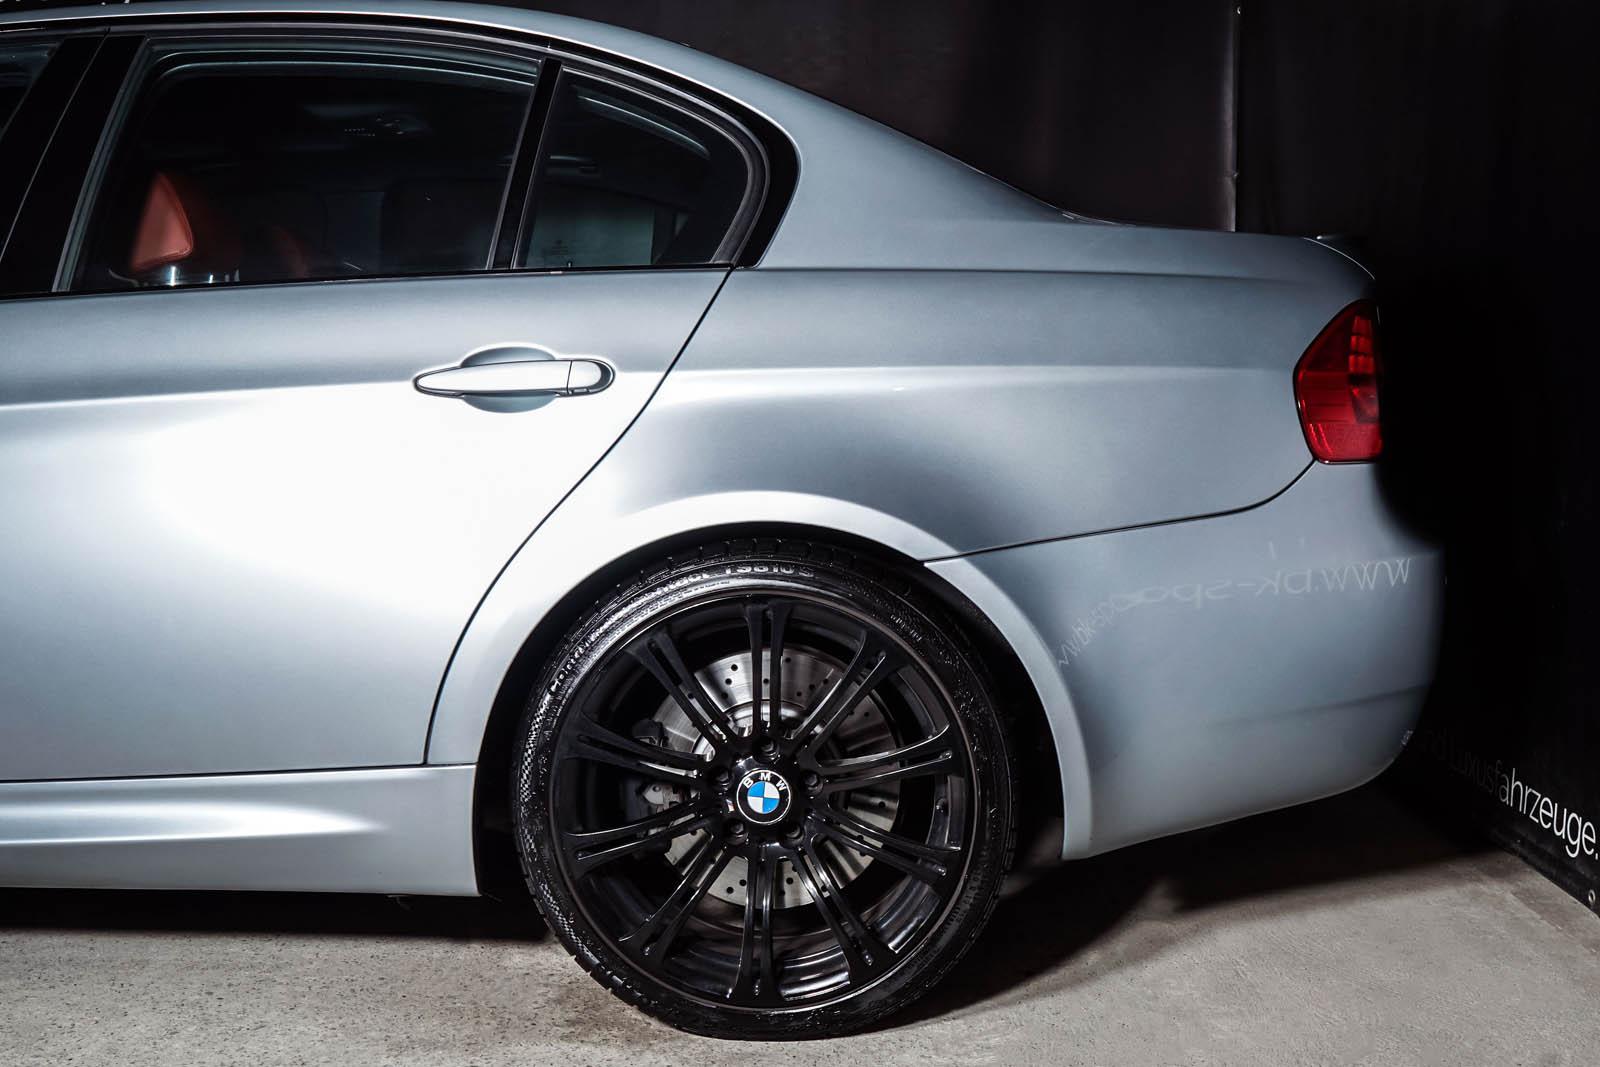 bmw_m3_e90_carbon_individual_dekra_BMW-1390